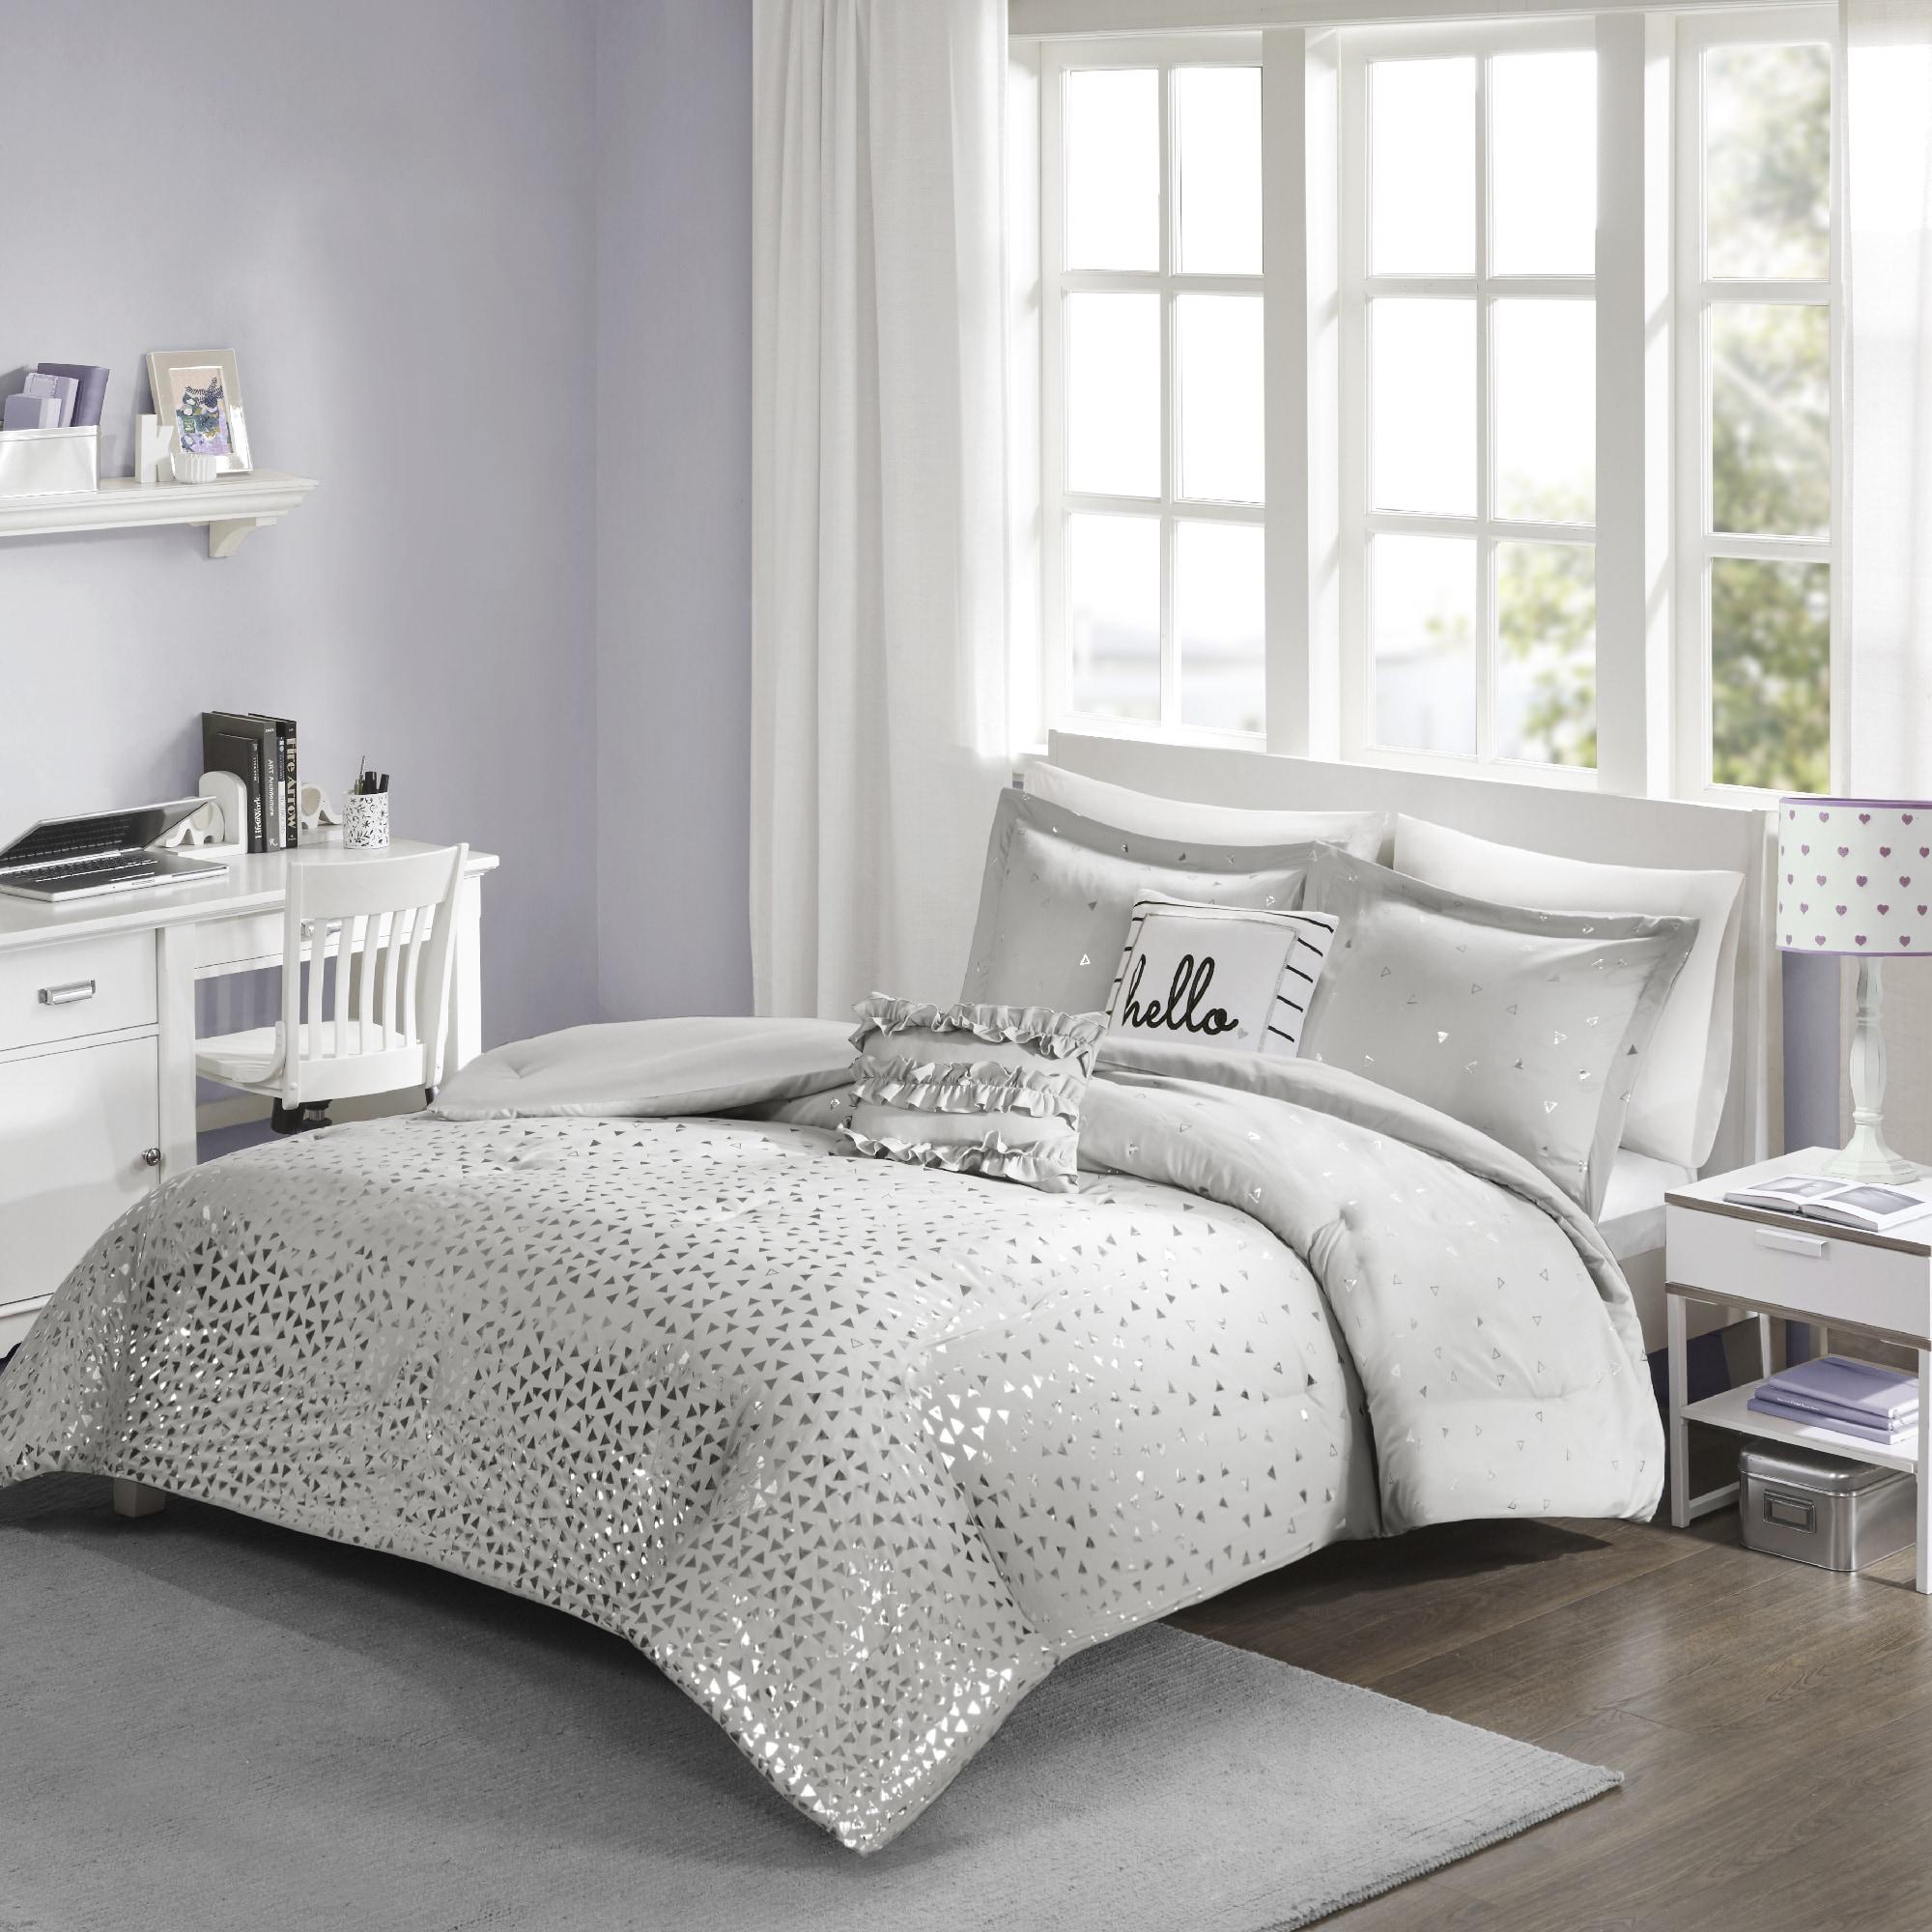 queen gray sets purple black comforter set white silver pcs bedding